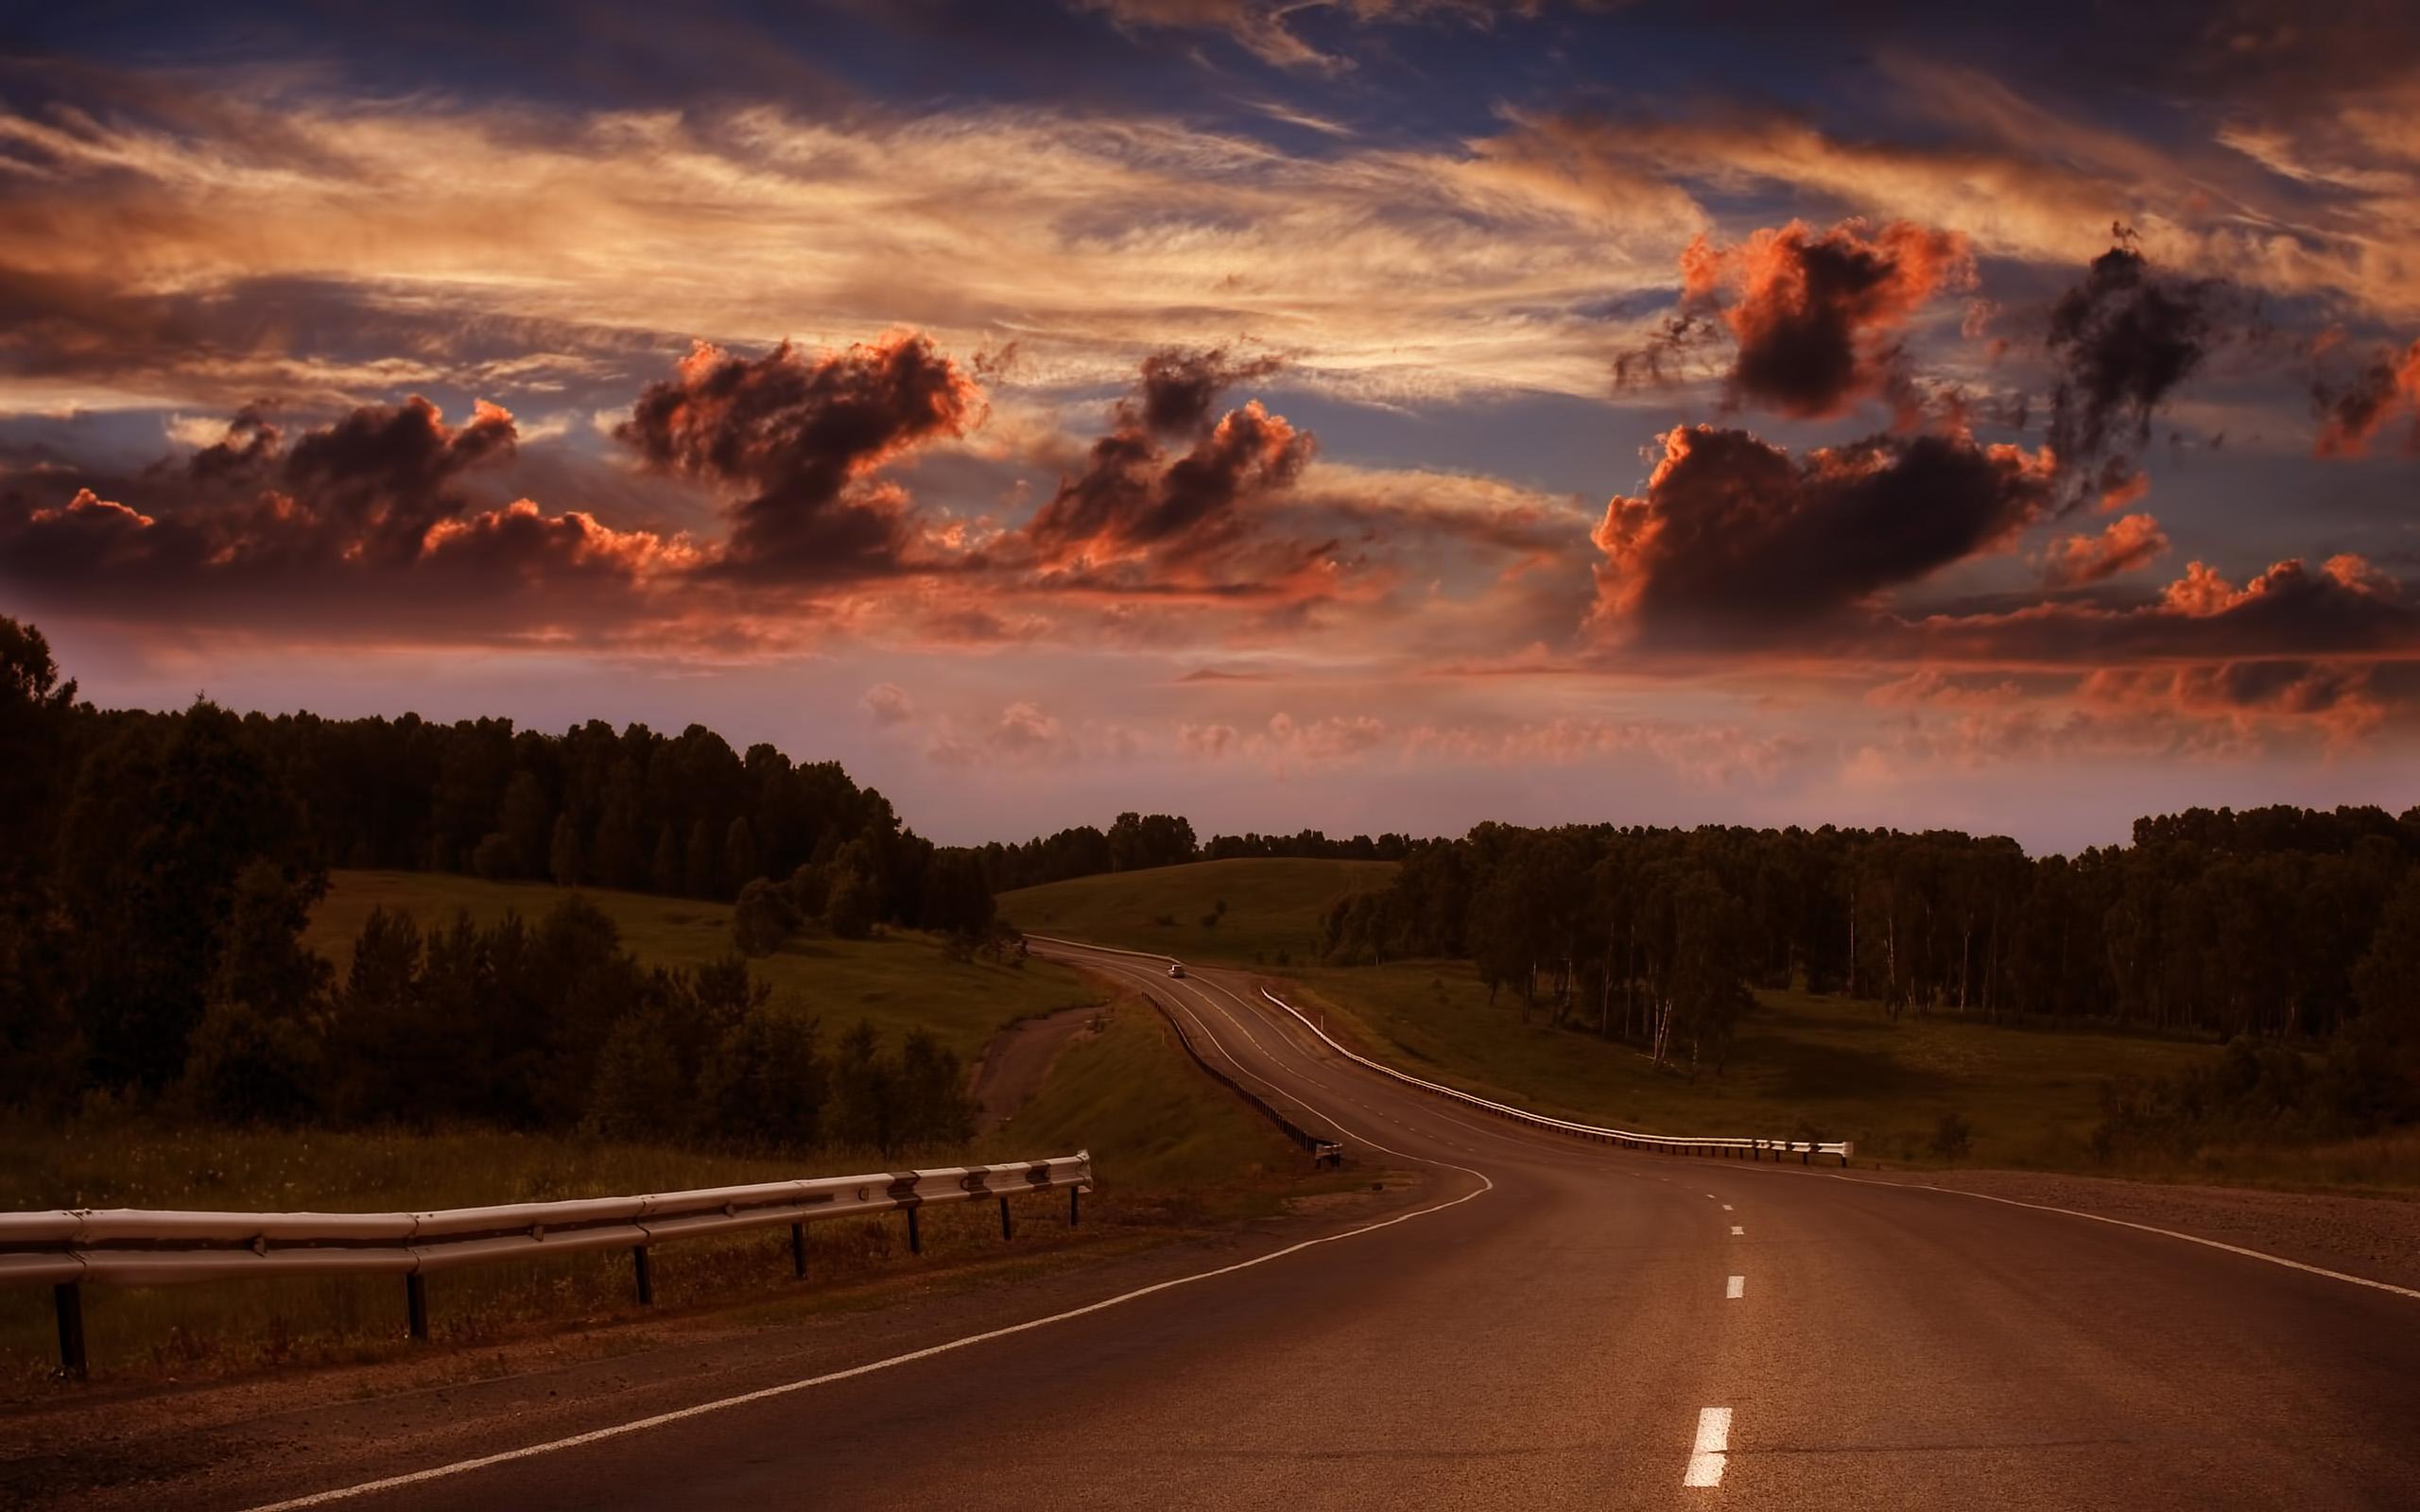 картинки дороги в даль